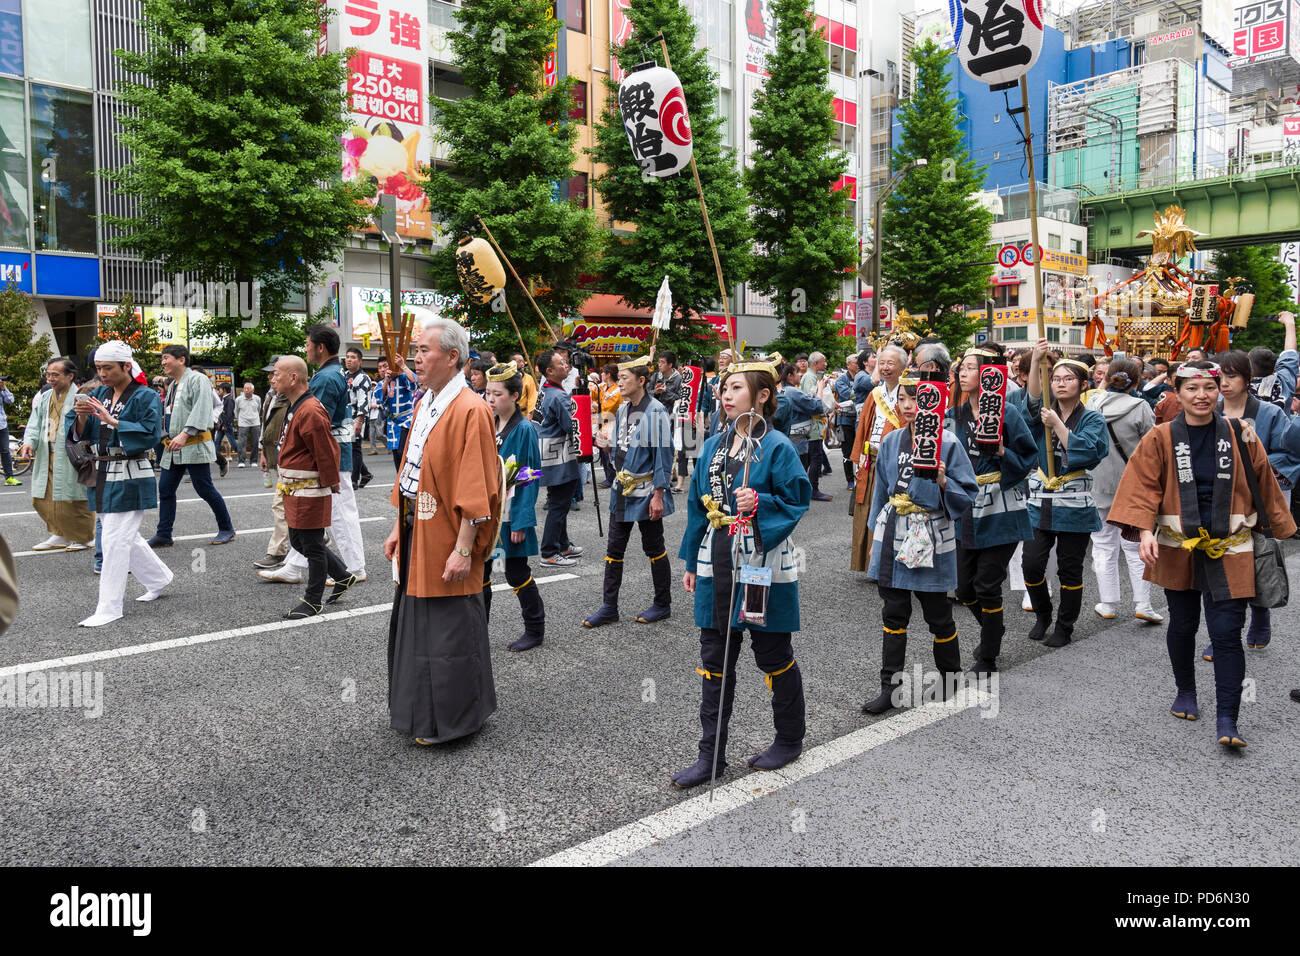 Giappone, isola di Honshu, Kanto, Tokyo, festival, Kanda matsuri. Immagini Stock